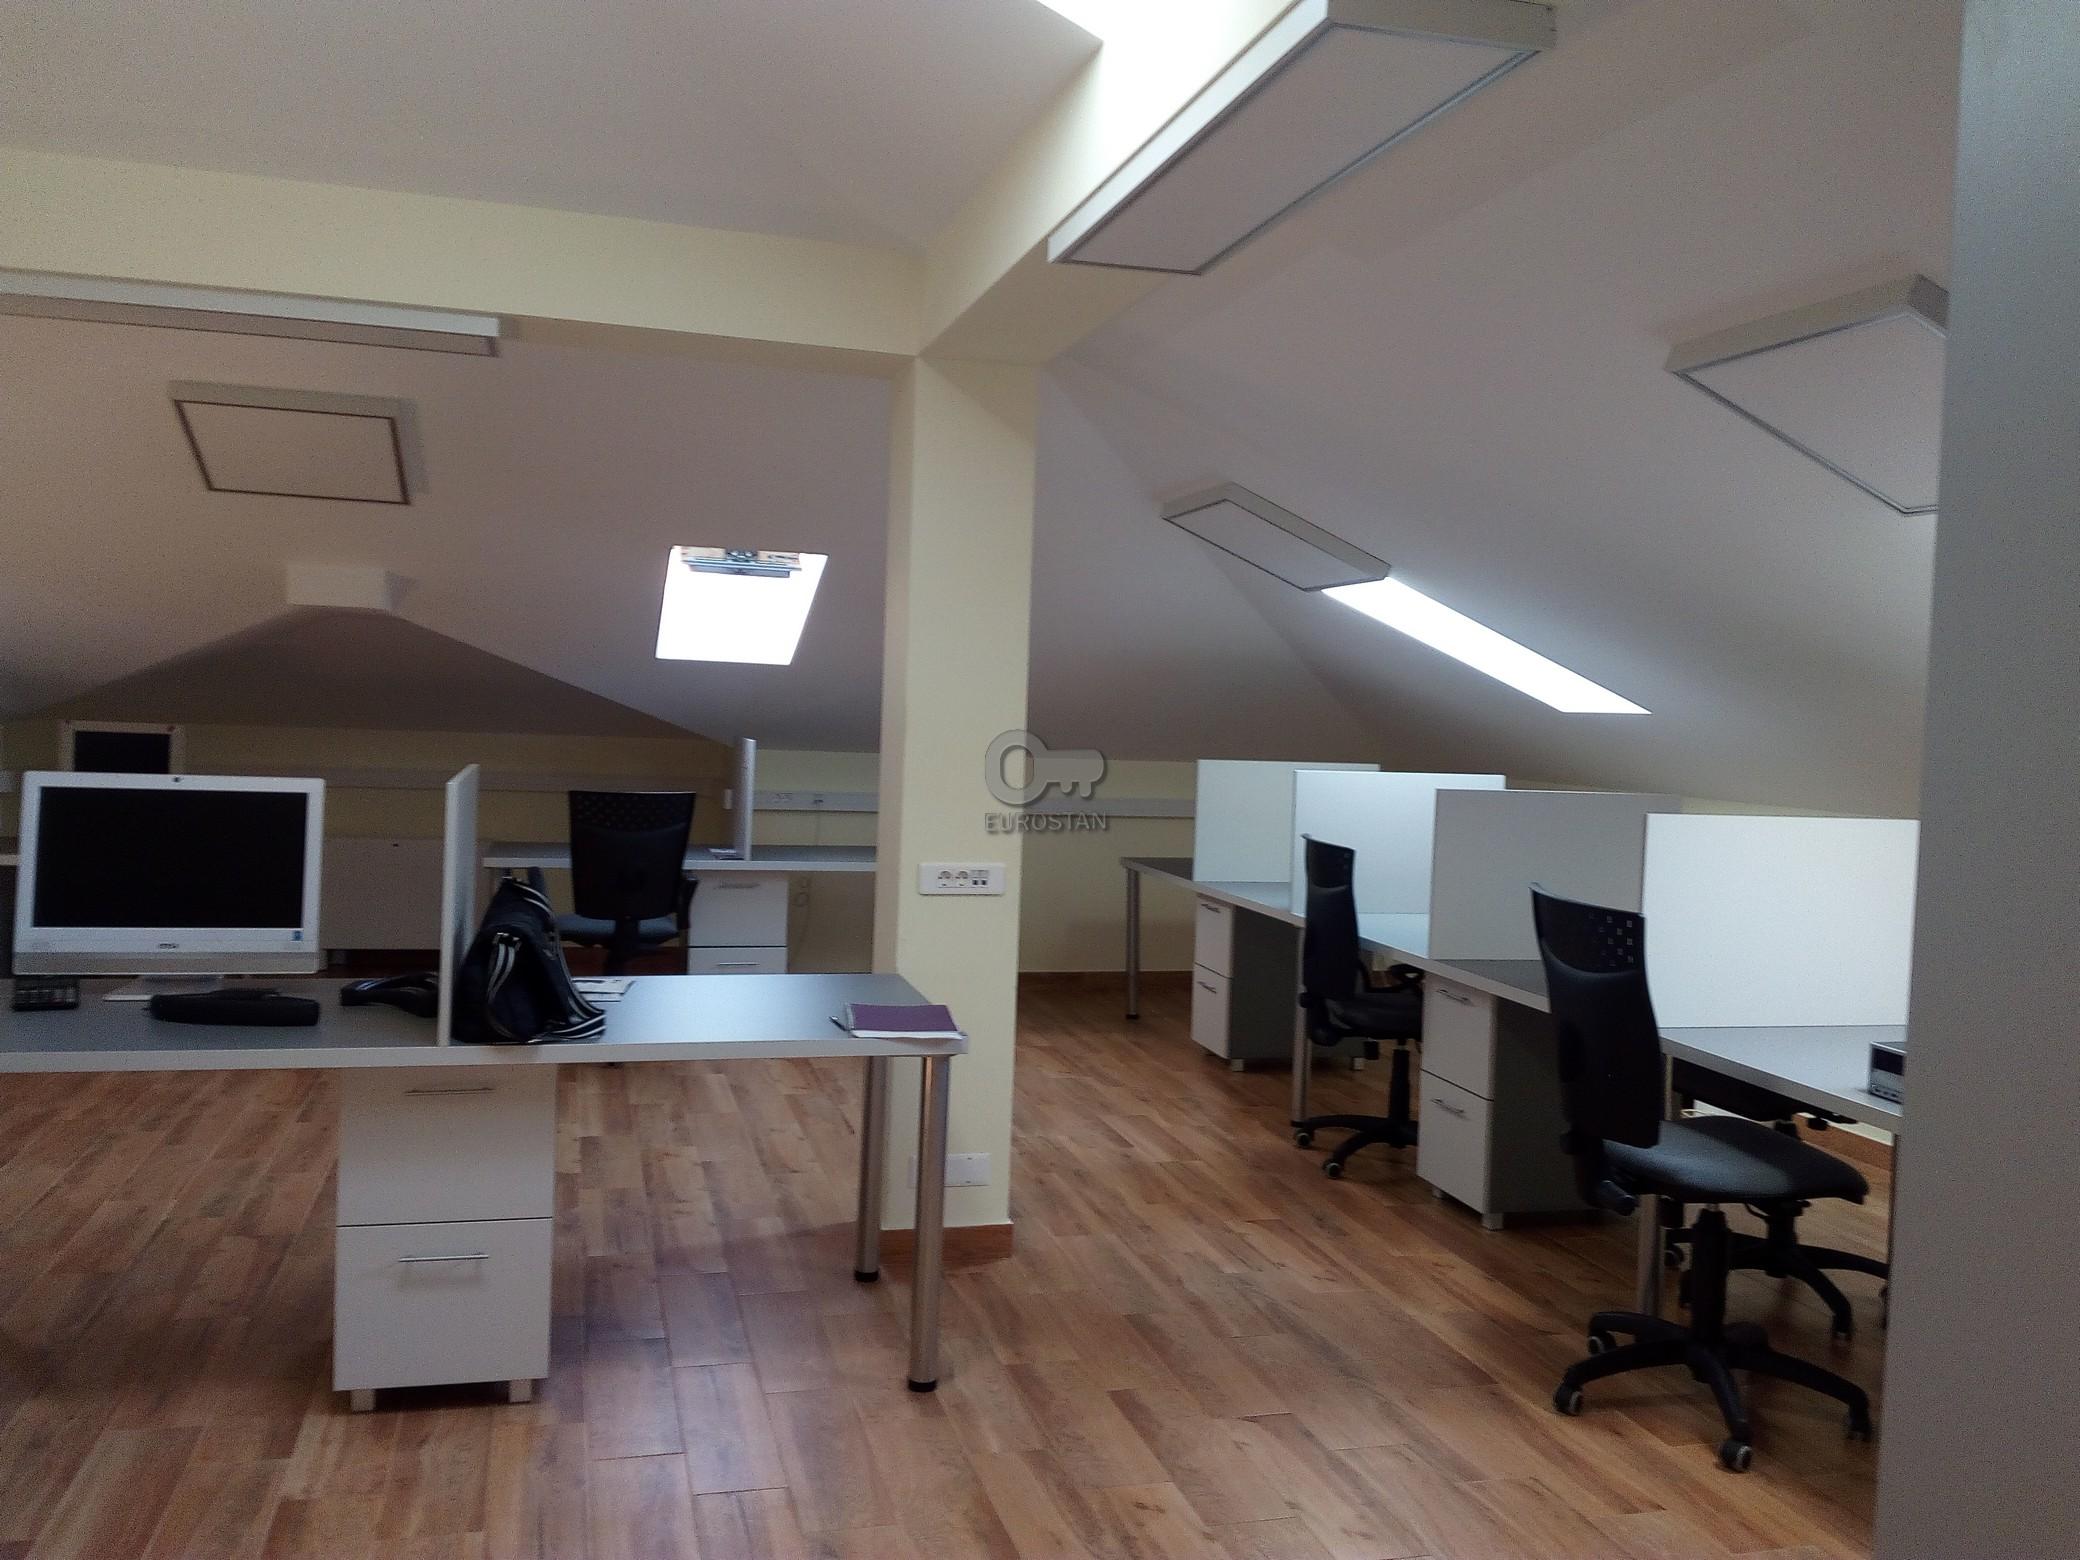 Poslovni prostor BLOK 60 1200 EUR